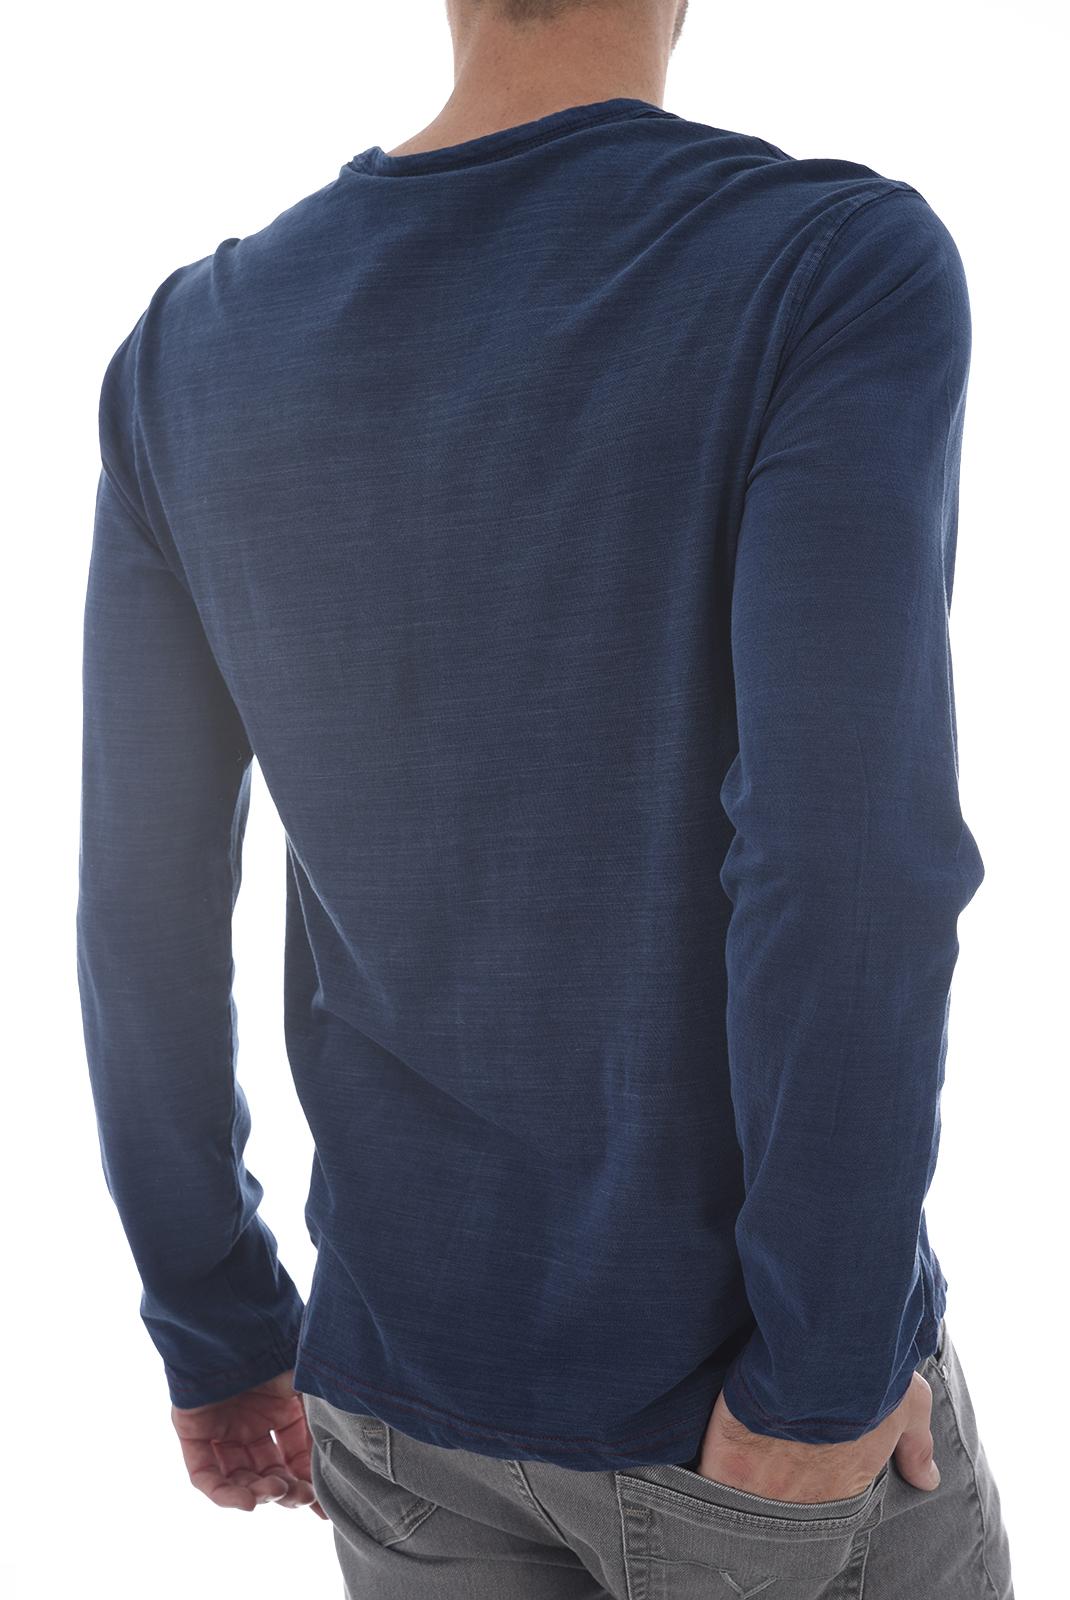 Tee-shirts  Kaporal BANGO H18 INDIGO